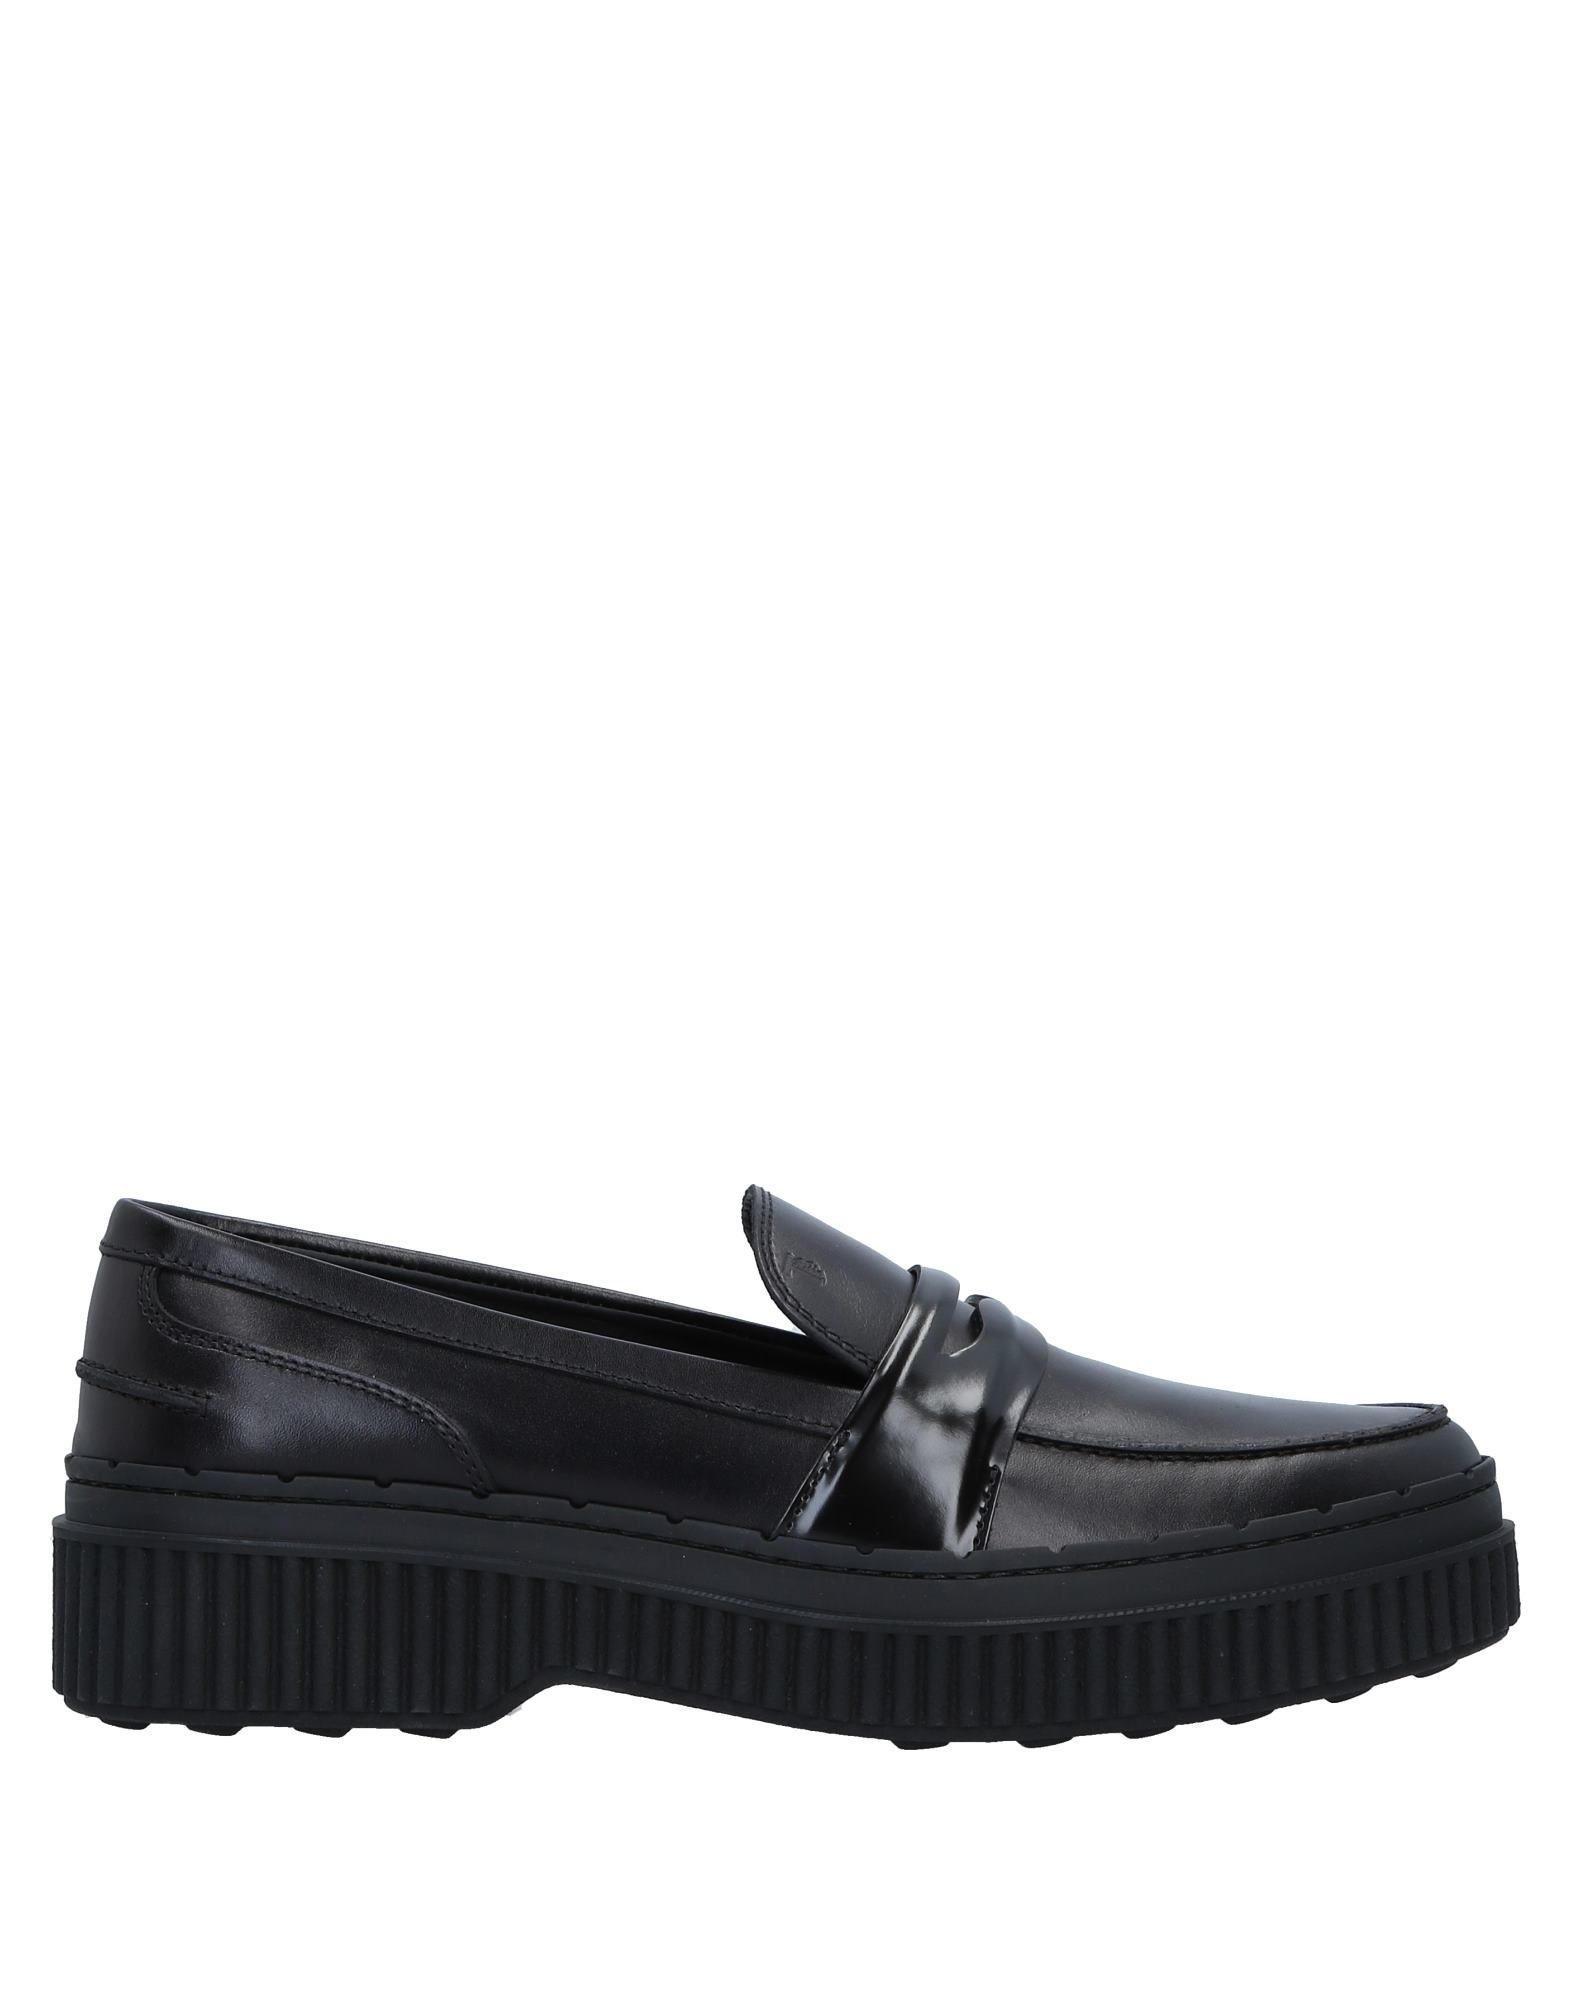 Rabatt Schuhe 11542297TH Tod's Mokassins Damen  11542297TH Schuhe 389113